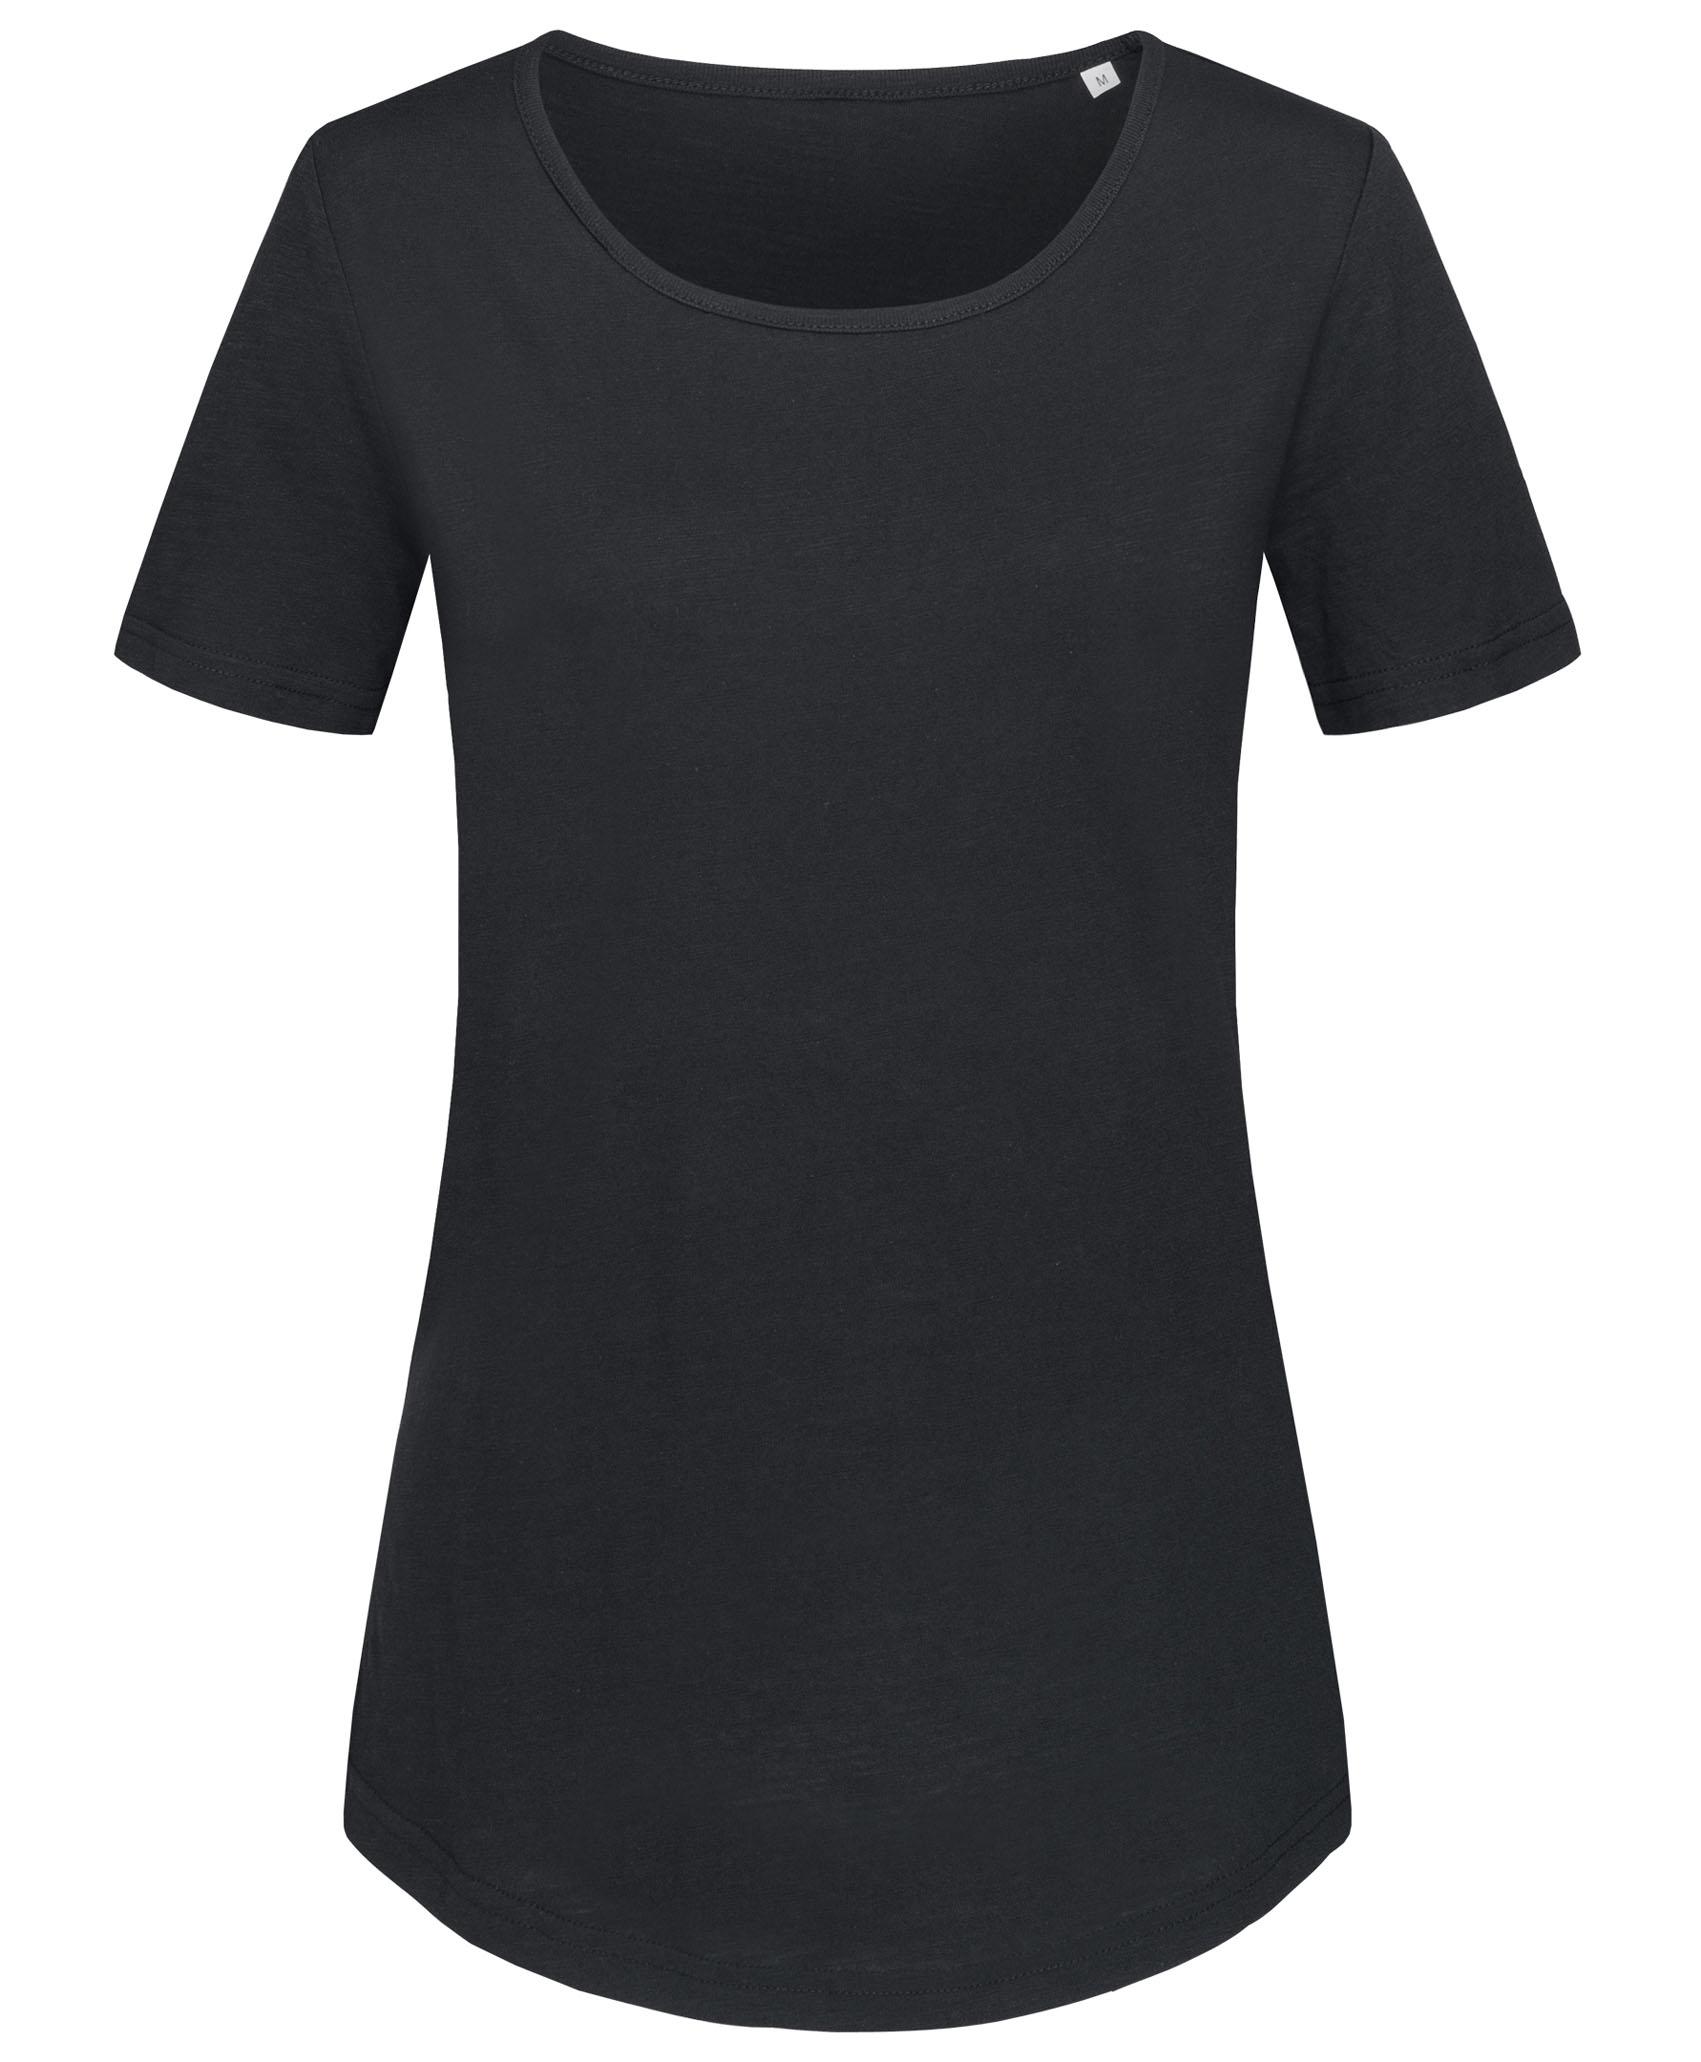 Stedman T-shirt Crewneck Organic slub SS for her